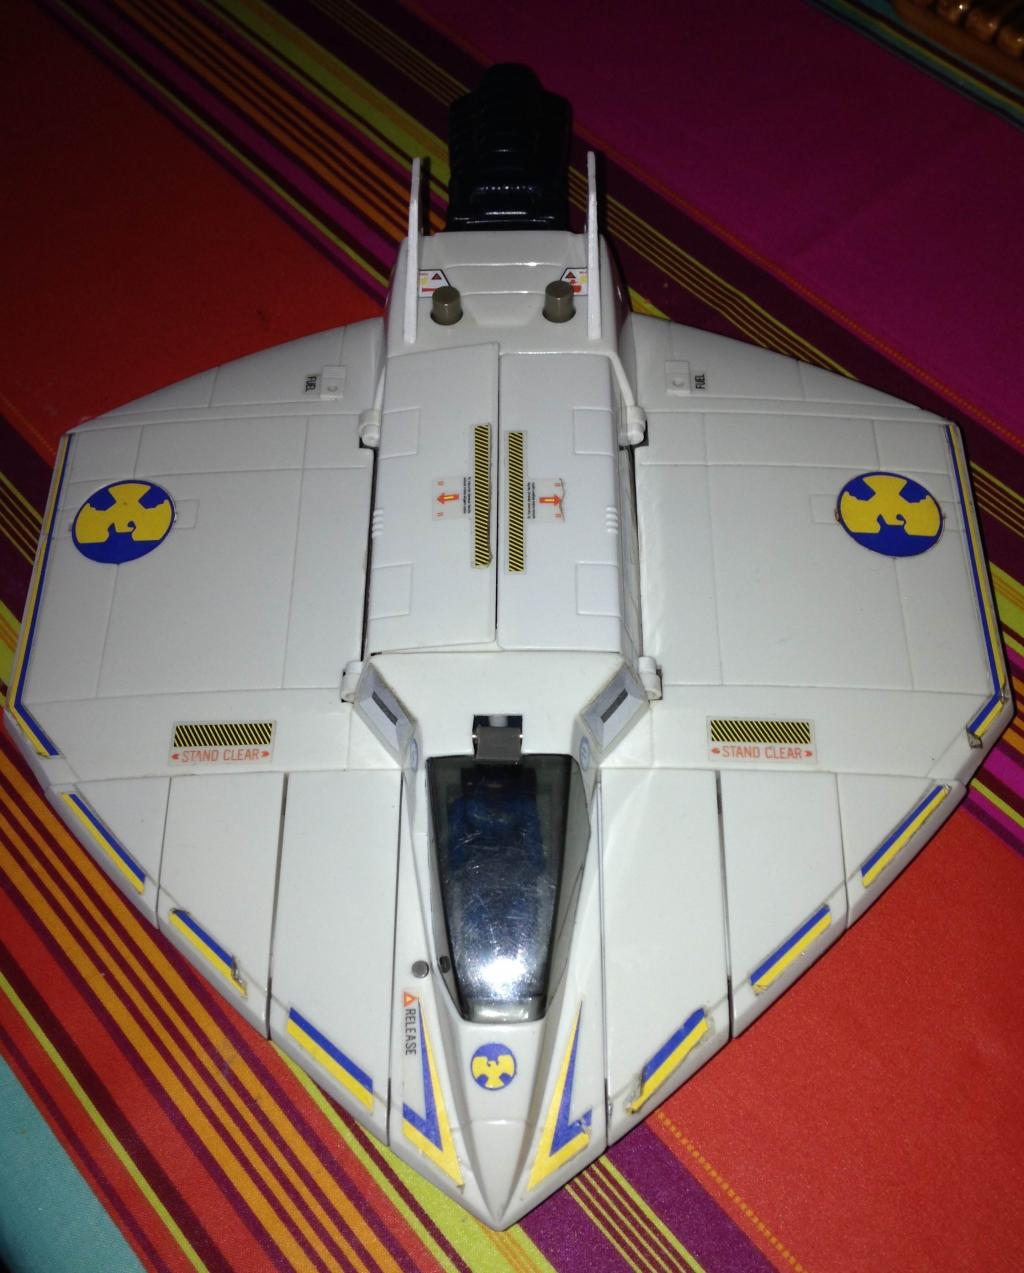 Starcom (COLECO) 1986 Img_3578-4328abe